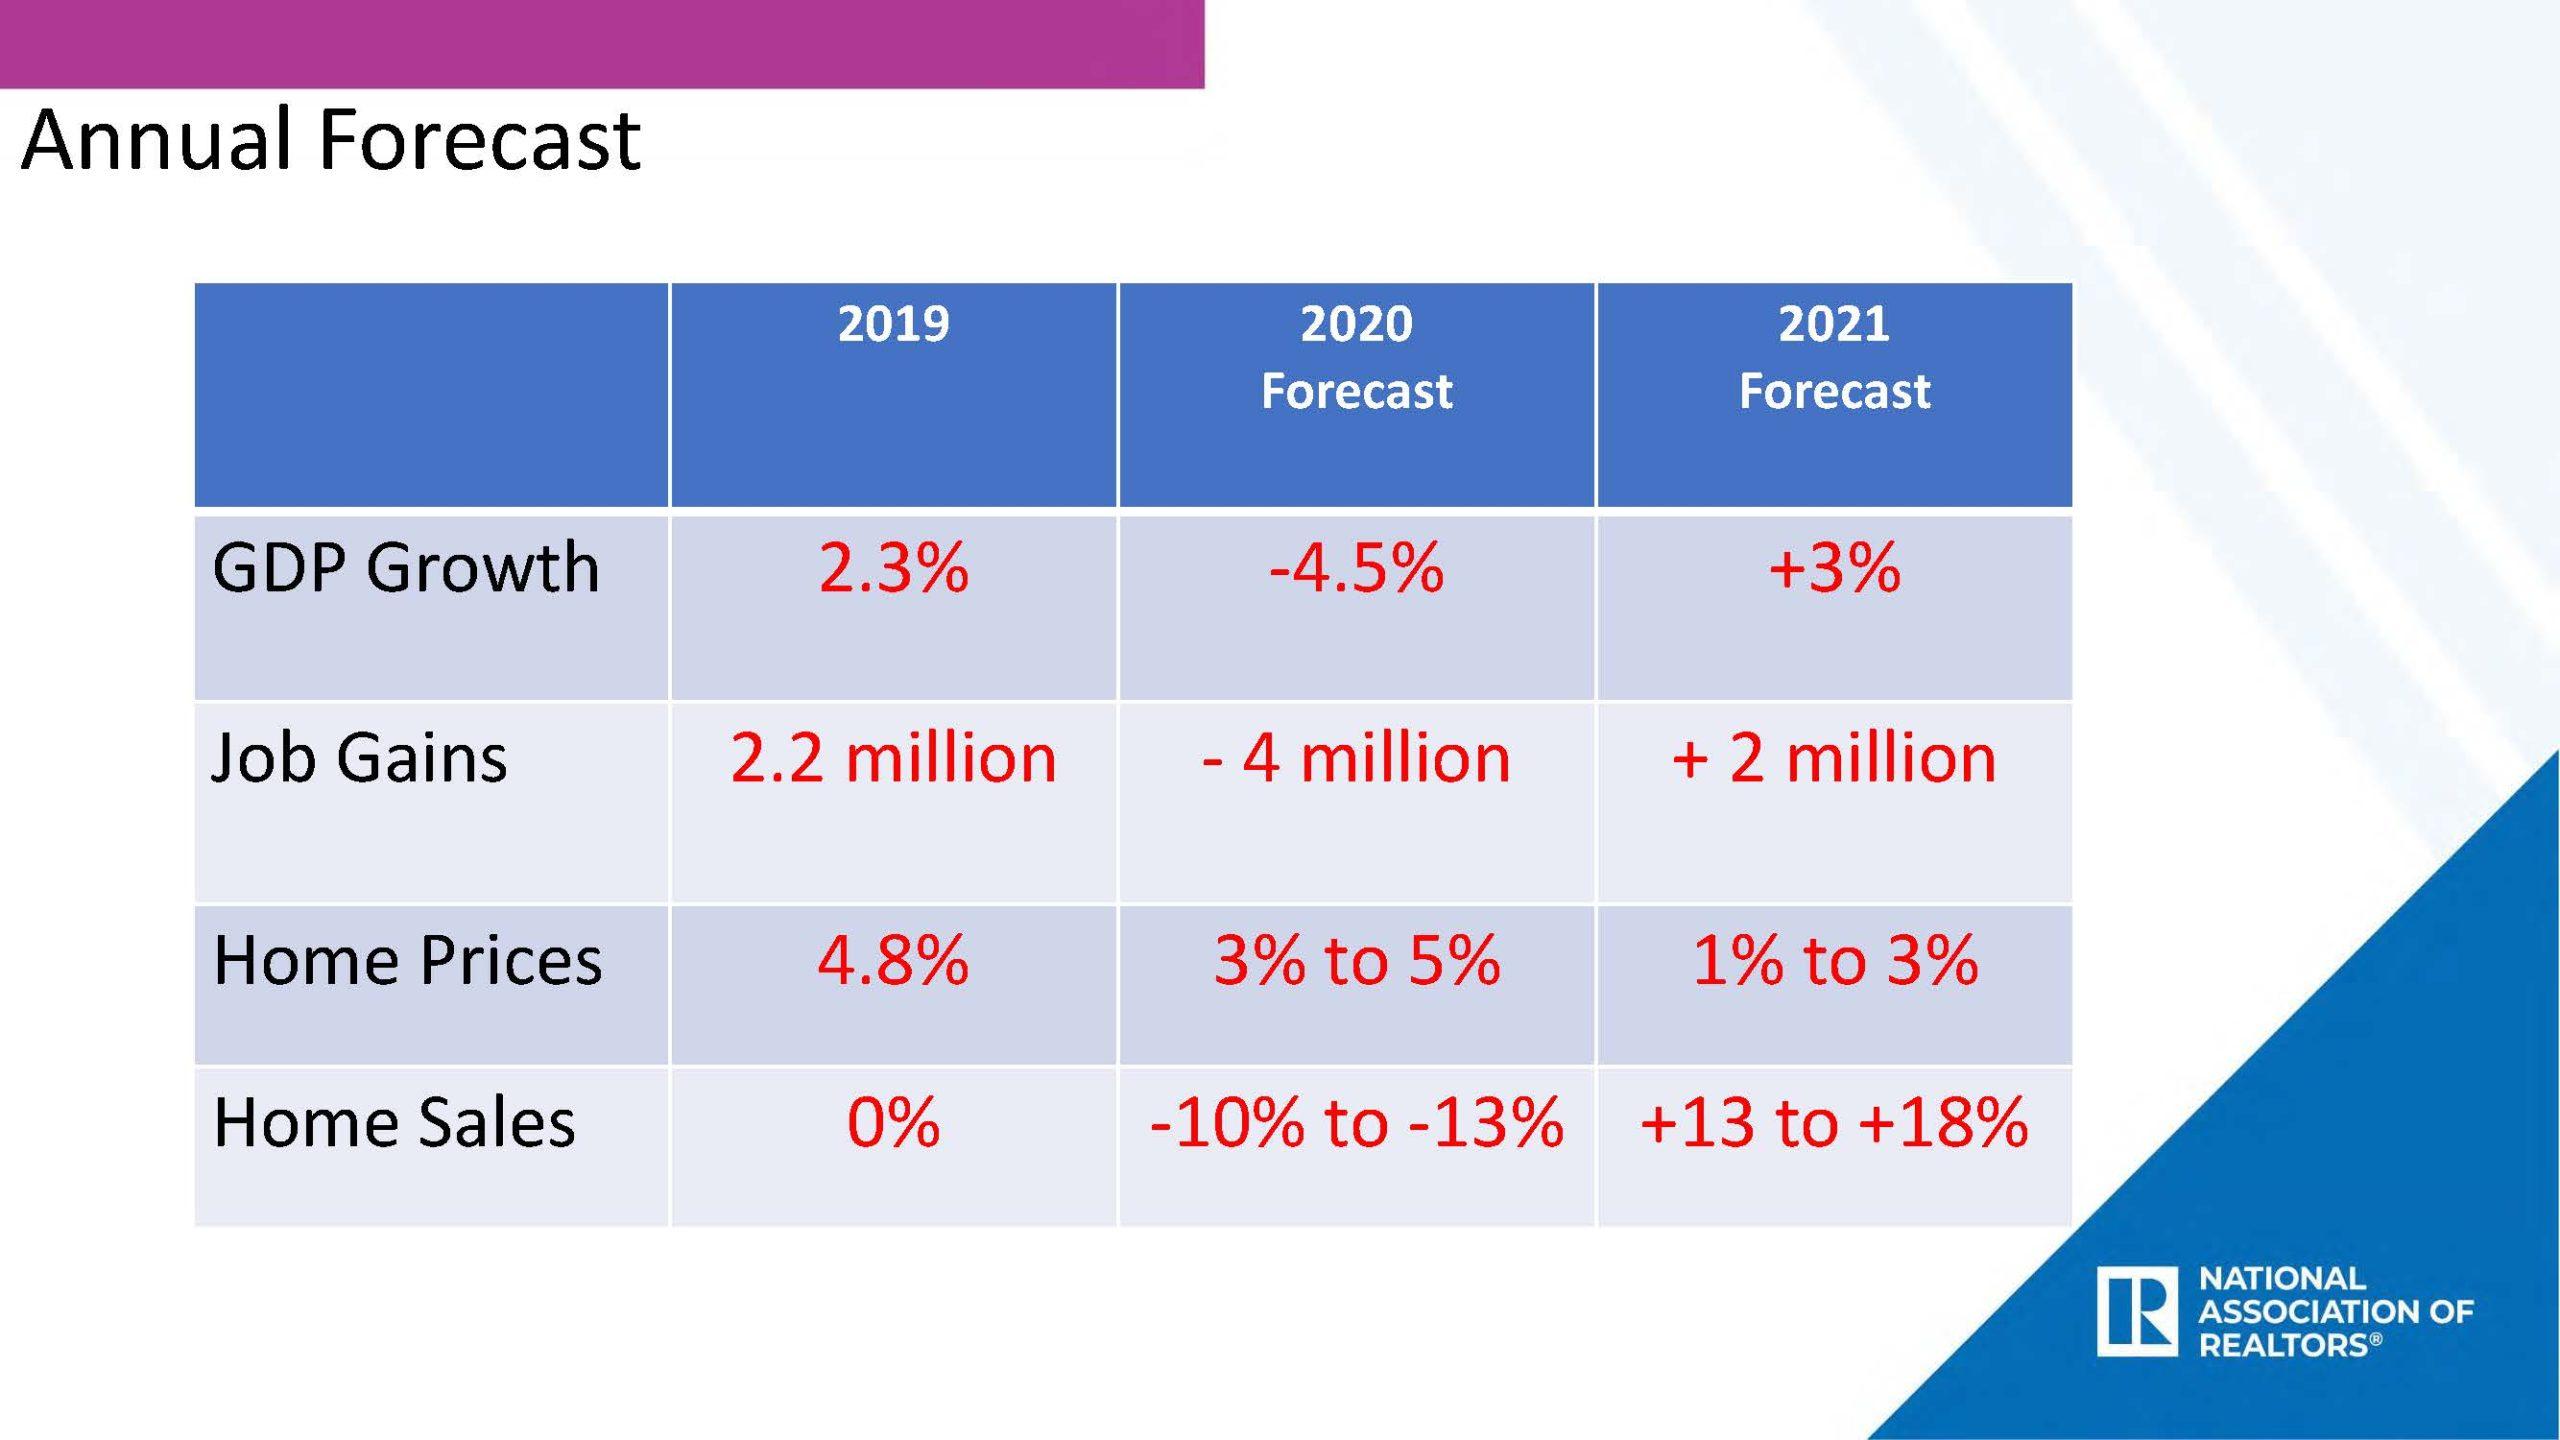 Annual Forecast